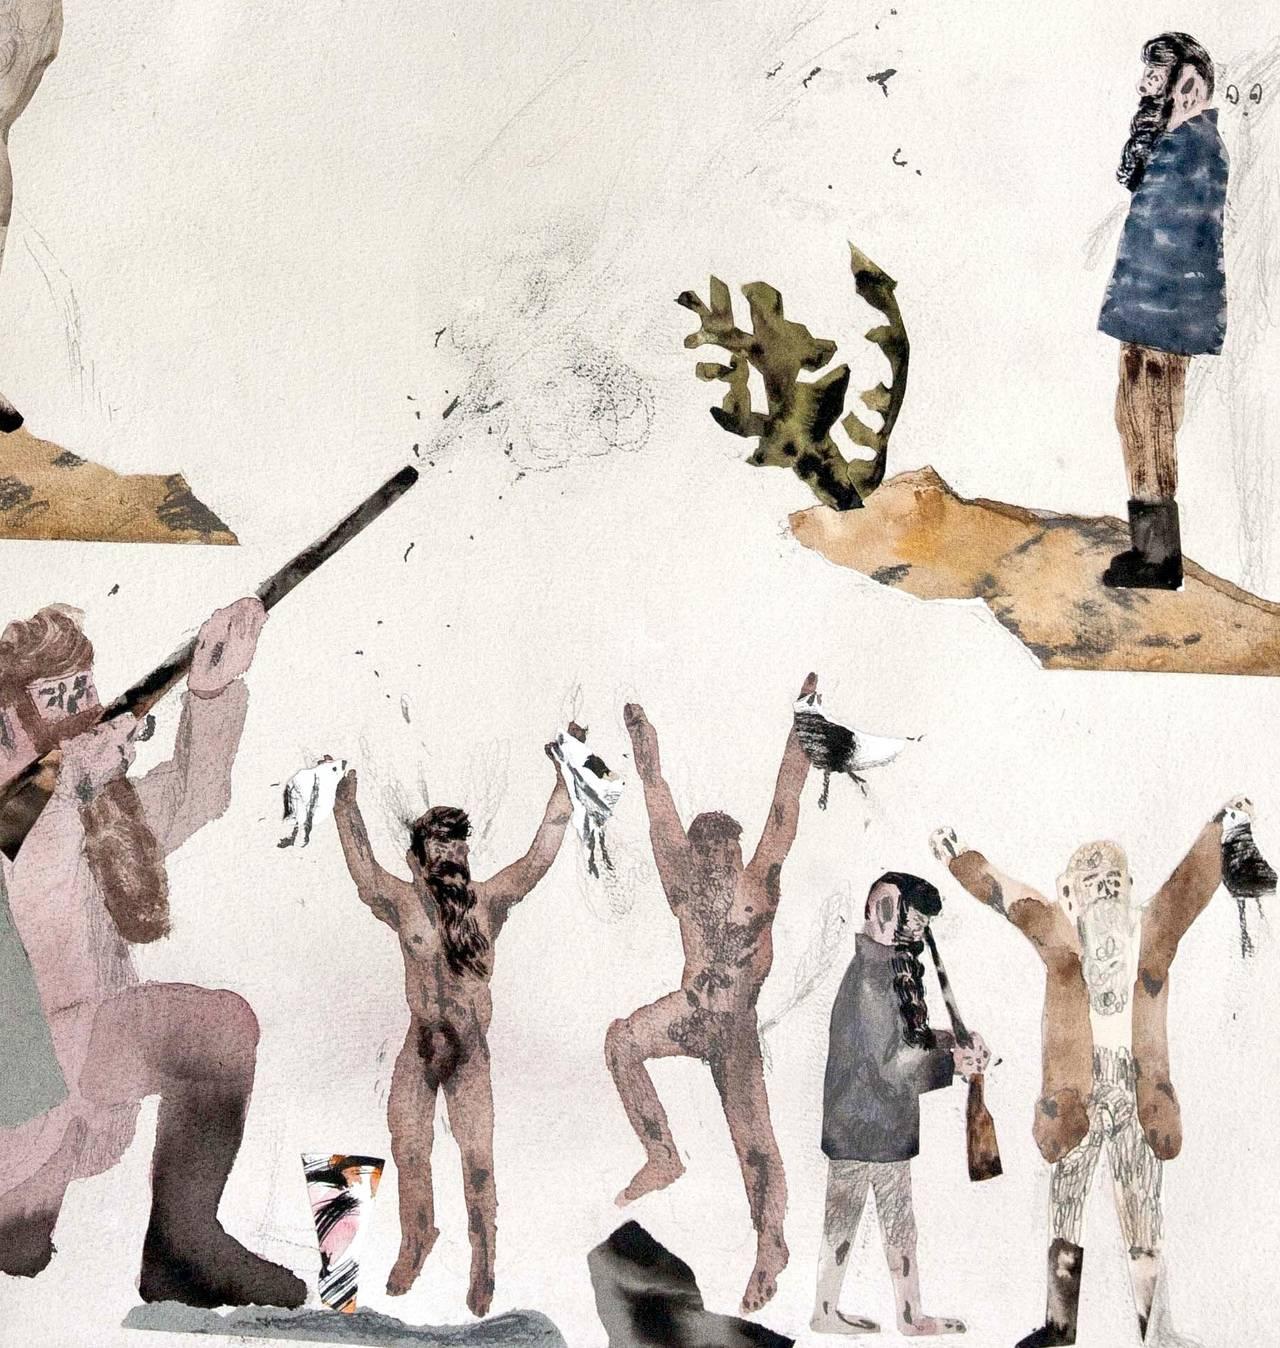 Master Evokes Cheers of Joy from Natives - Art by Guðmundur Thoroddsen